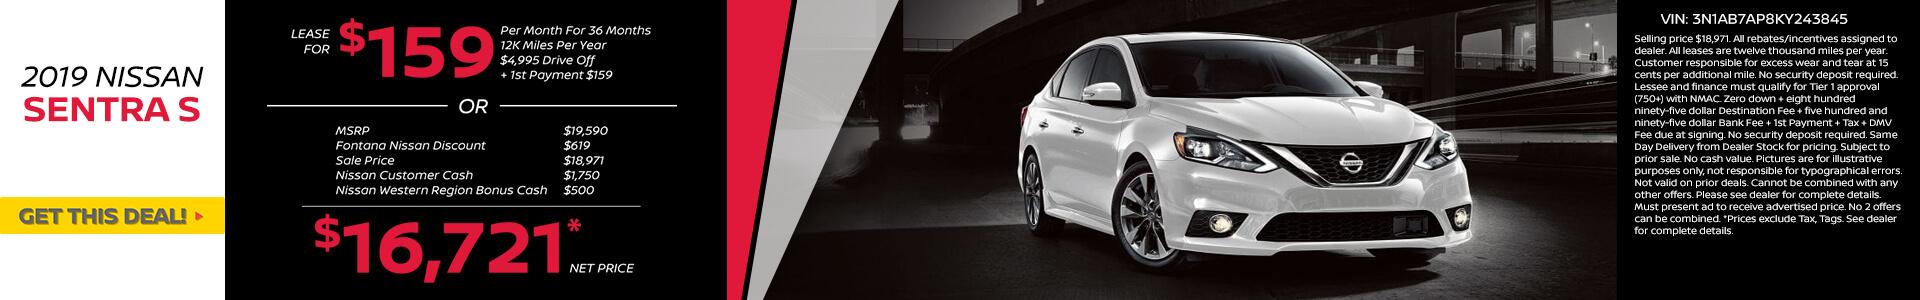 Nissan Sentra $159 Lease